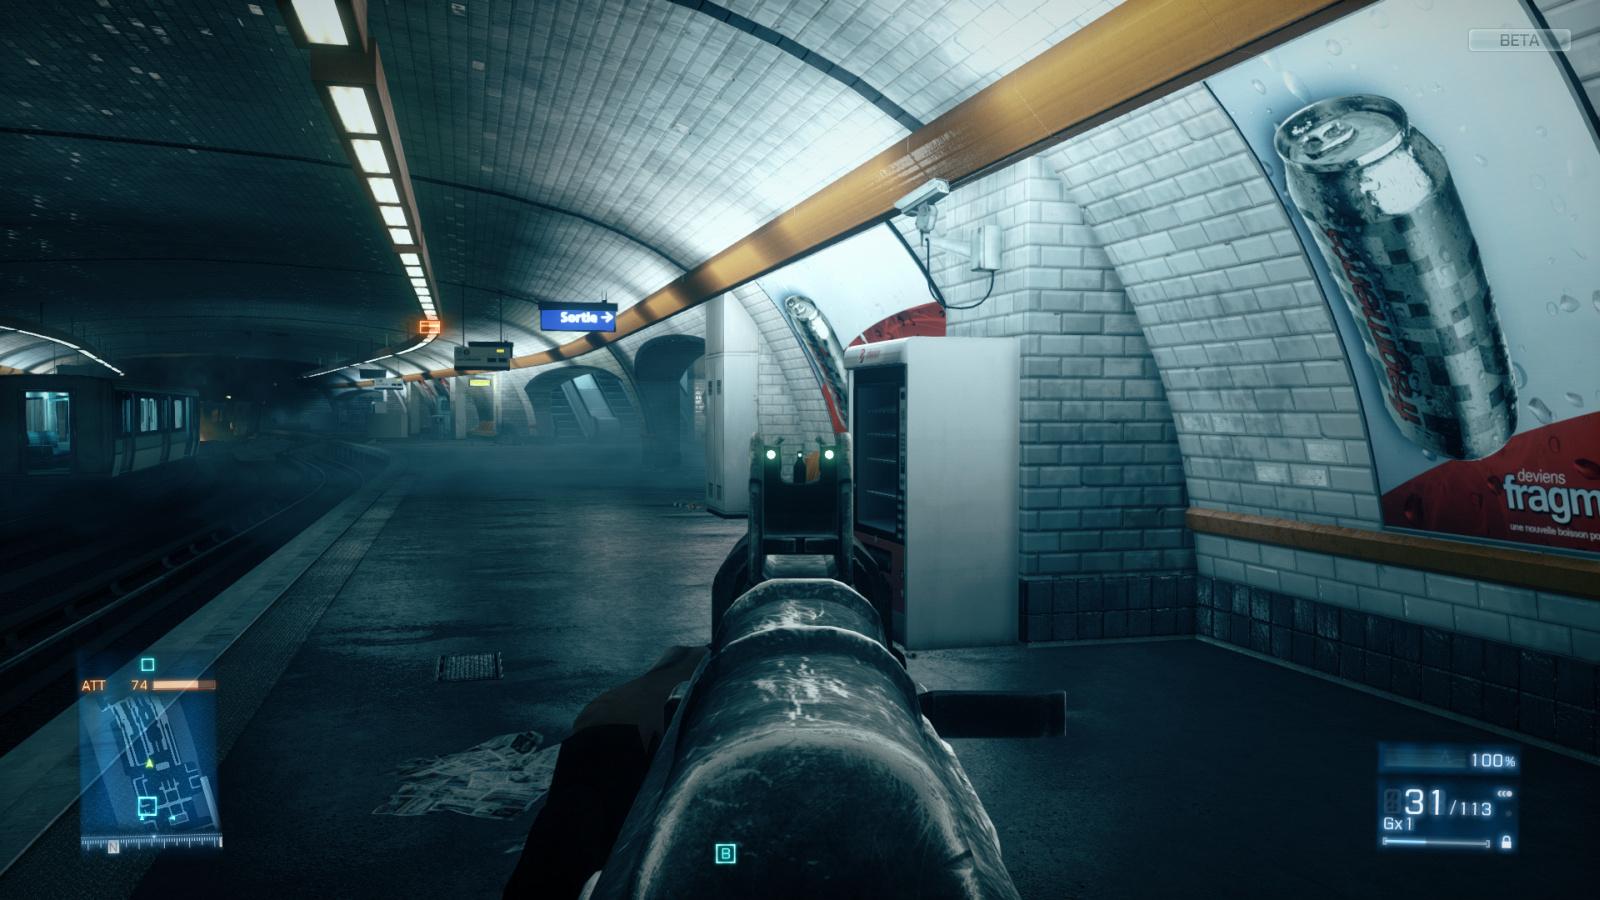 Beta Battlefieldu 3 je live – hratelnost, grafika, galerie 52478